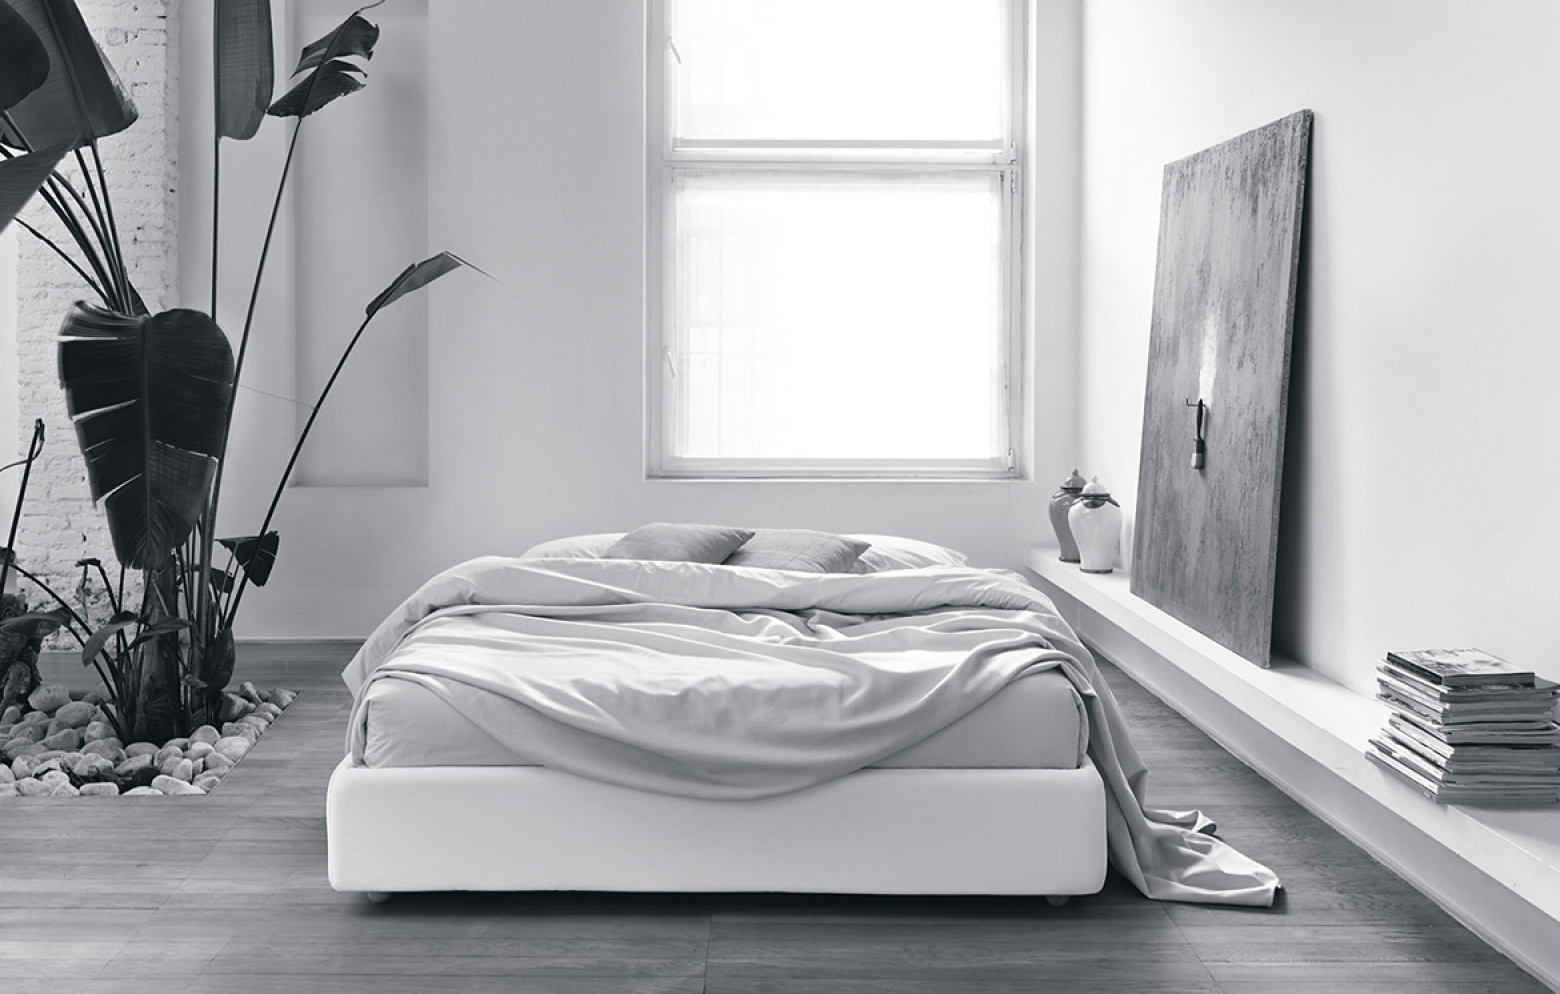 Full Size of Betten Outlet Sommier Bett Online Whos Perfect Dänisches Bettenlager Badezimmer überlänge Poco De Wohnwert Ikea 160x200 Somnus Nolte Kaufen Ottoversand Bett Betten Outlet